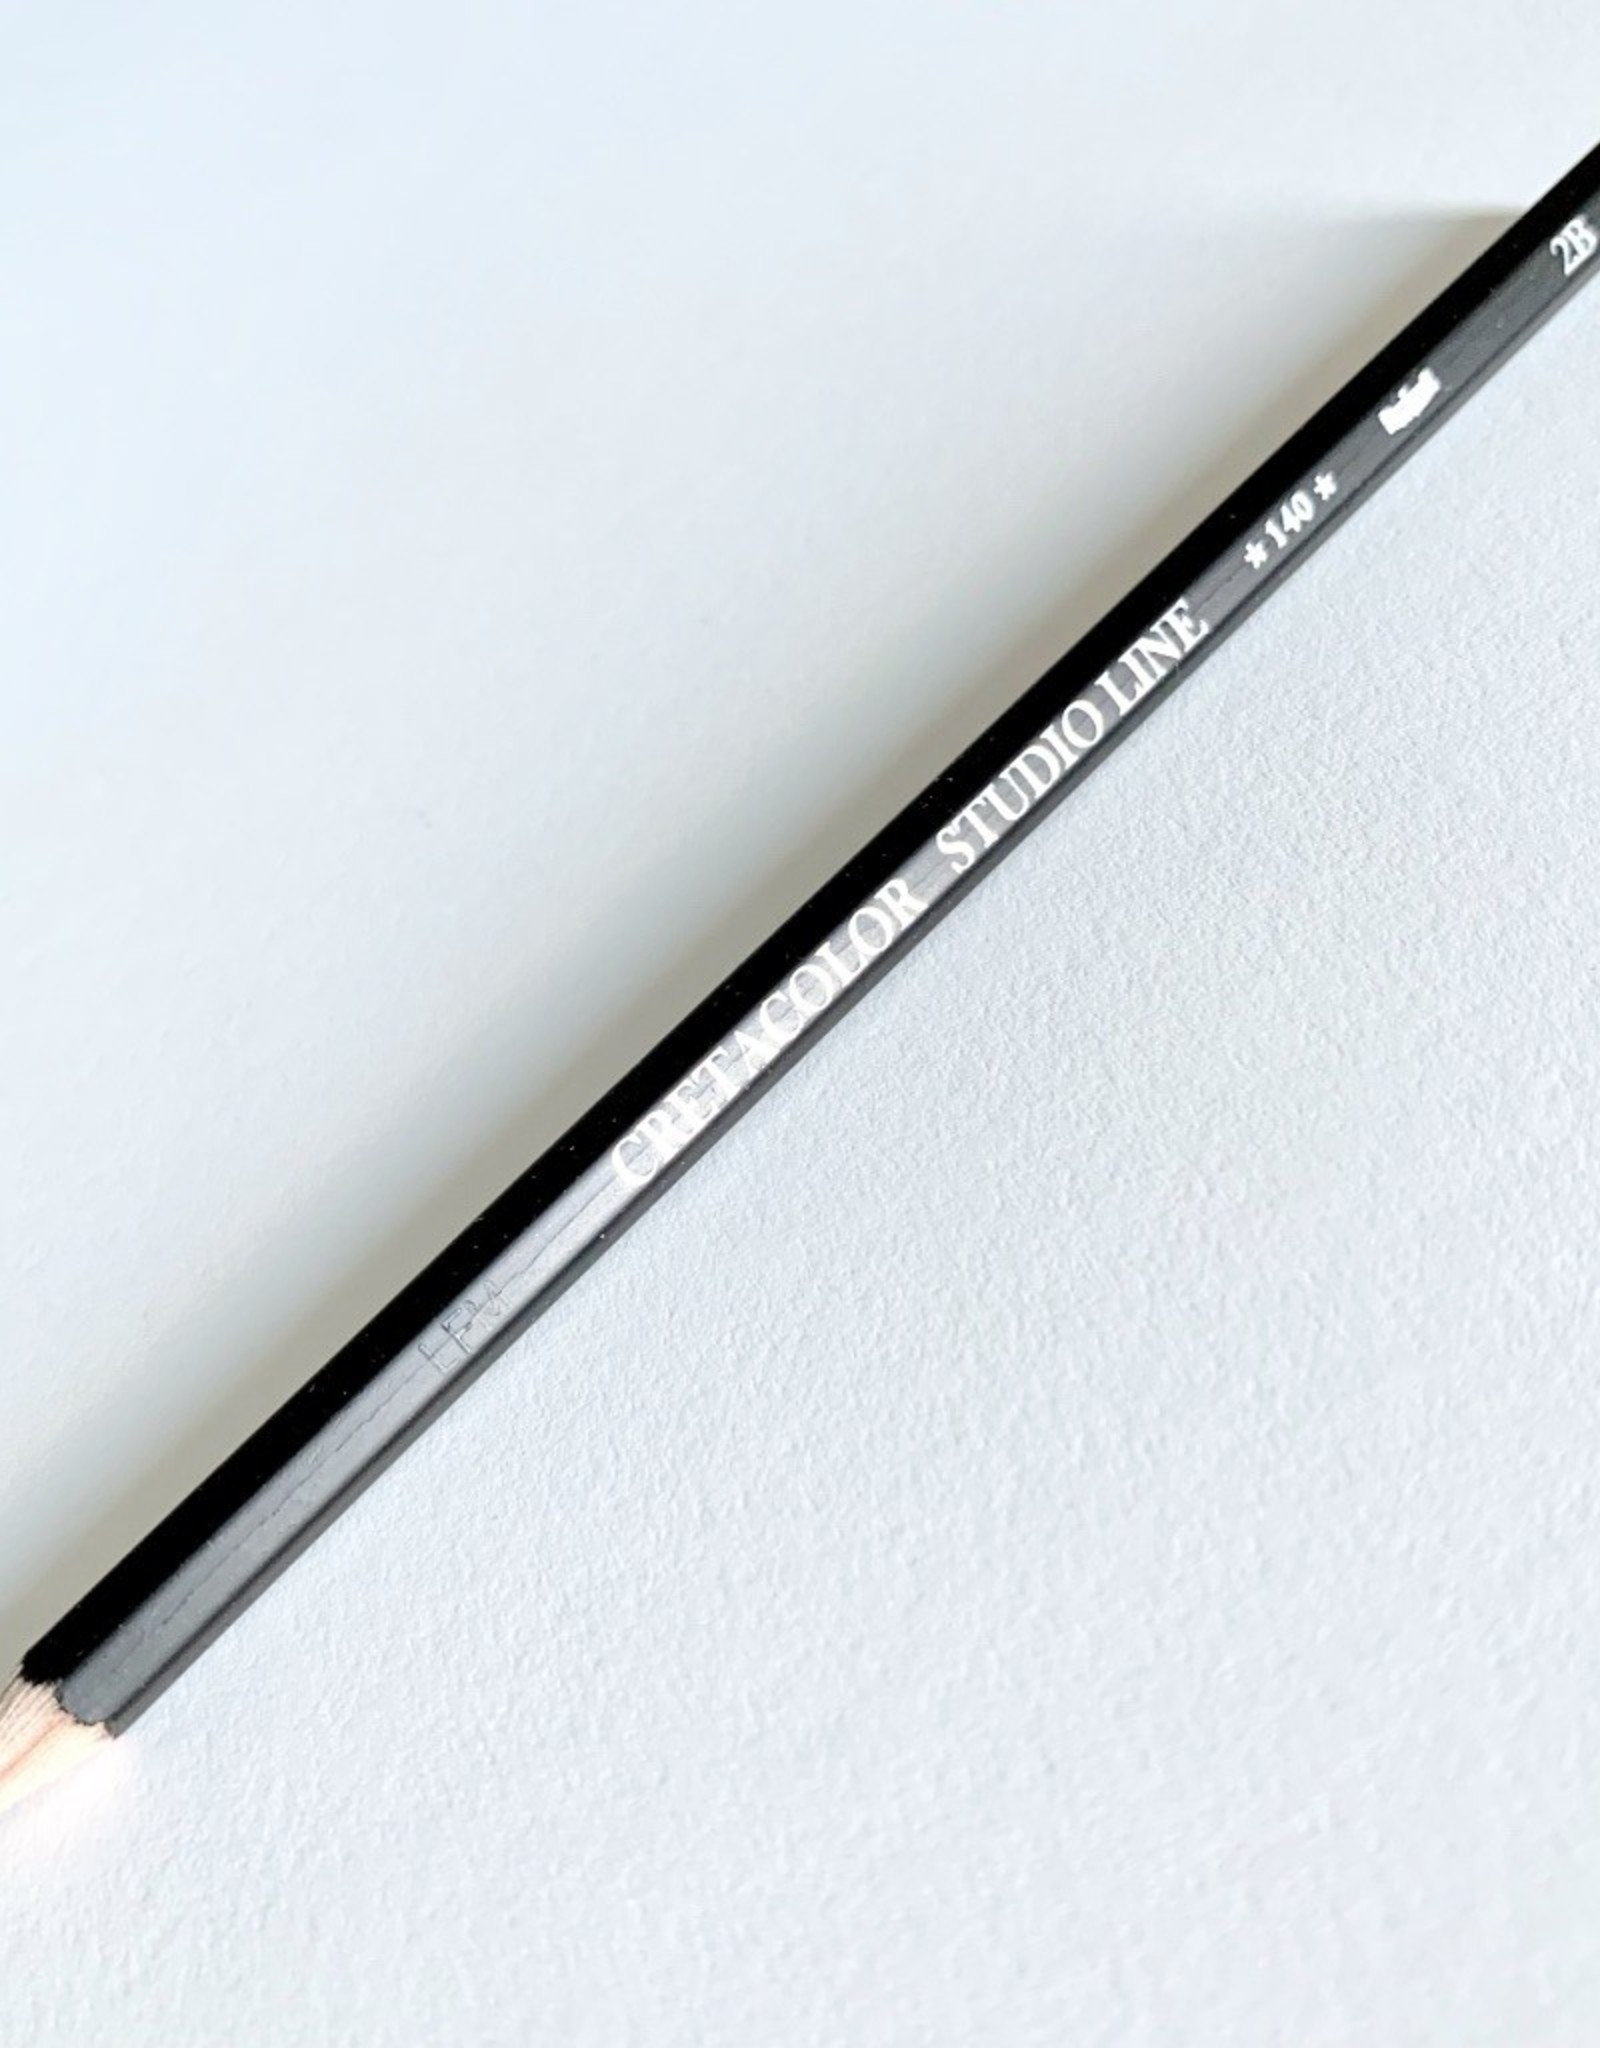 Cretacolor Artist Studio Line Graphite Pencil 2B